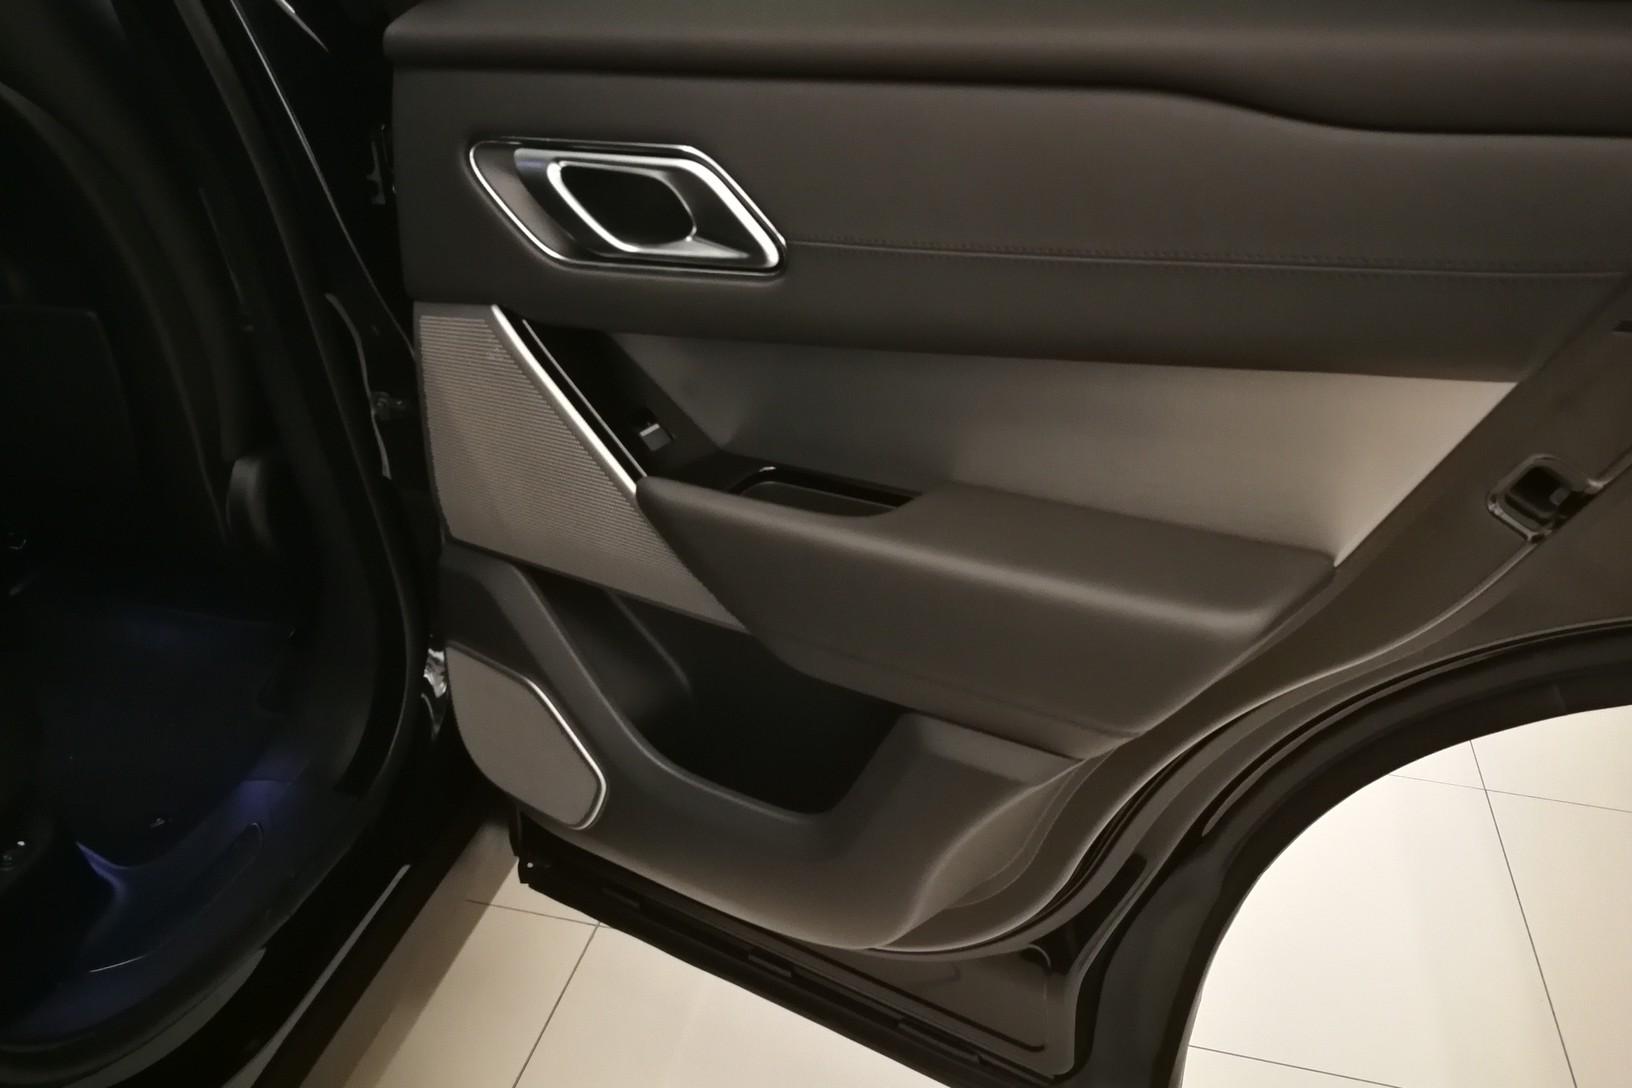 Land Rover Range Rover Velar 5.0 P550 SVAutobiography Dynamic Edition image 21